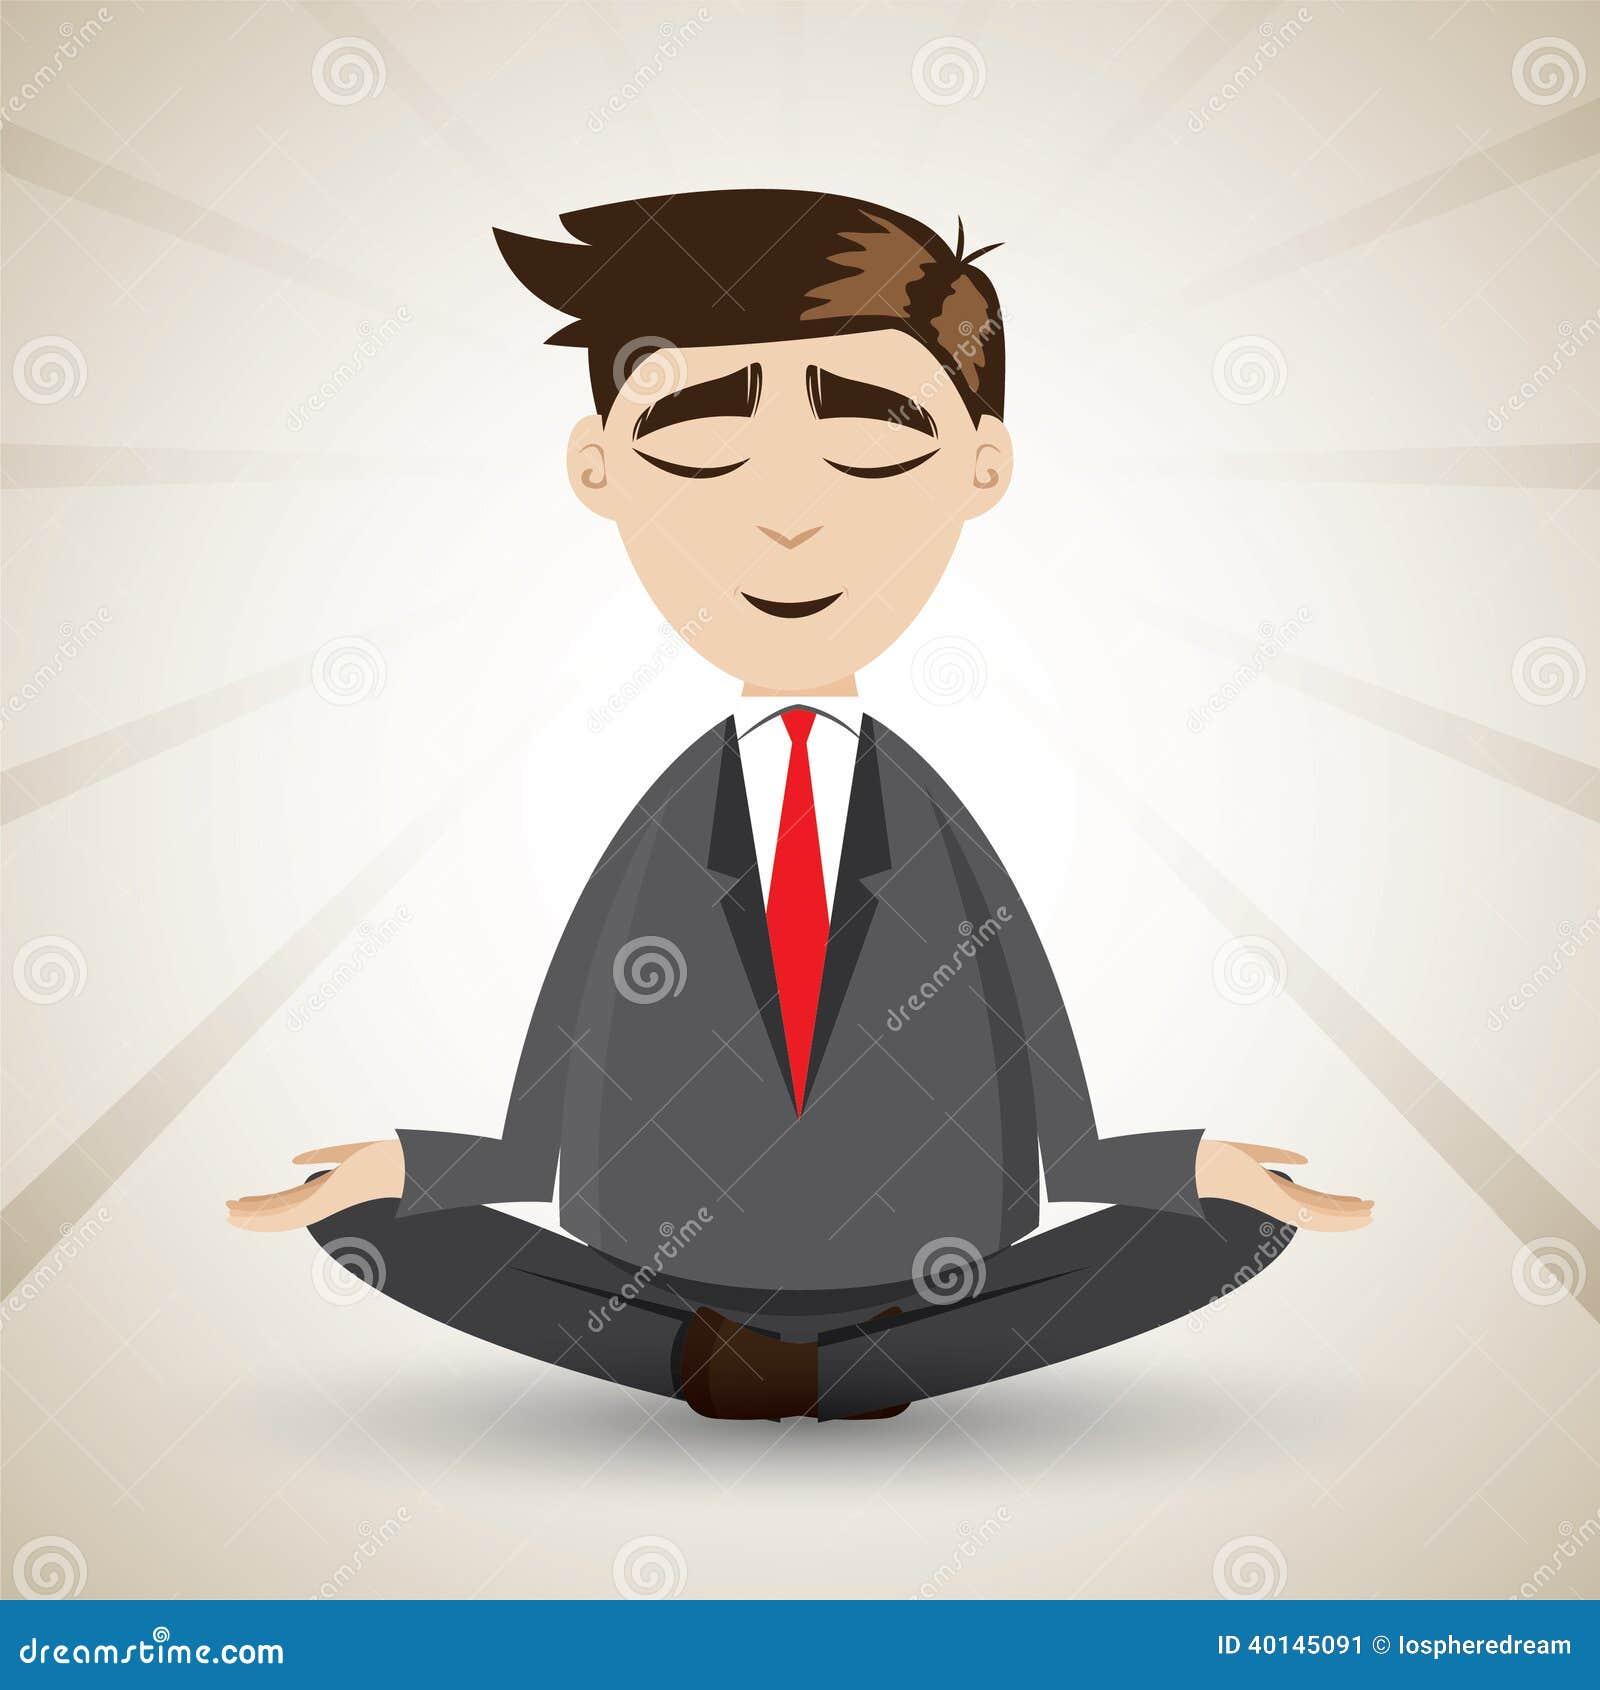 Cartoon businessman relaxing with meditation